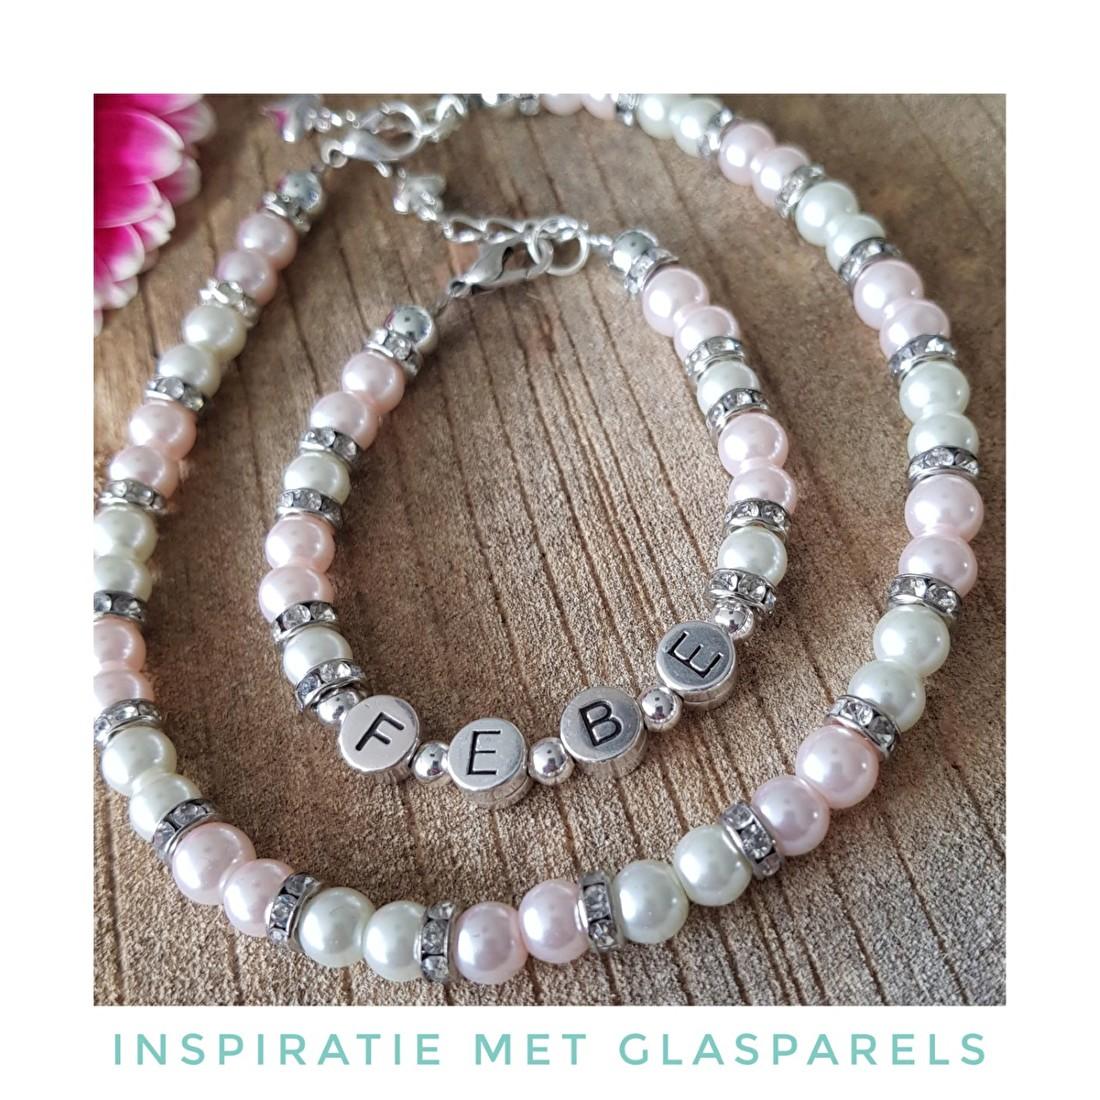 https://www.beautifulcolours.nl/c-5409272/sieraden-met-glasparels/